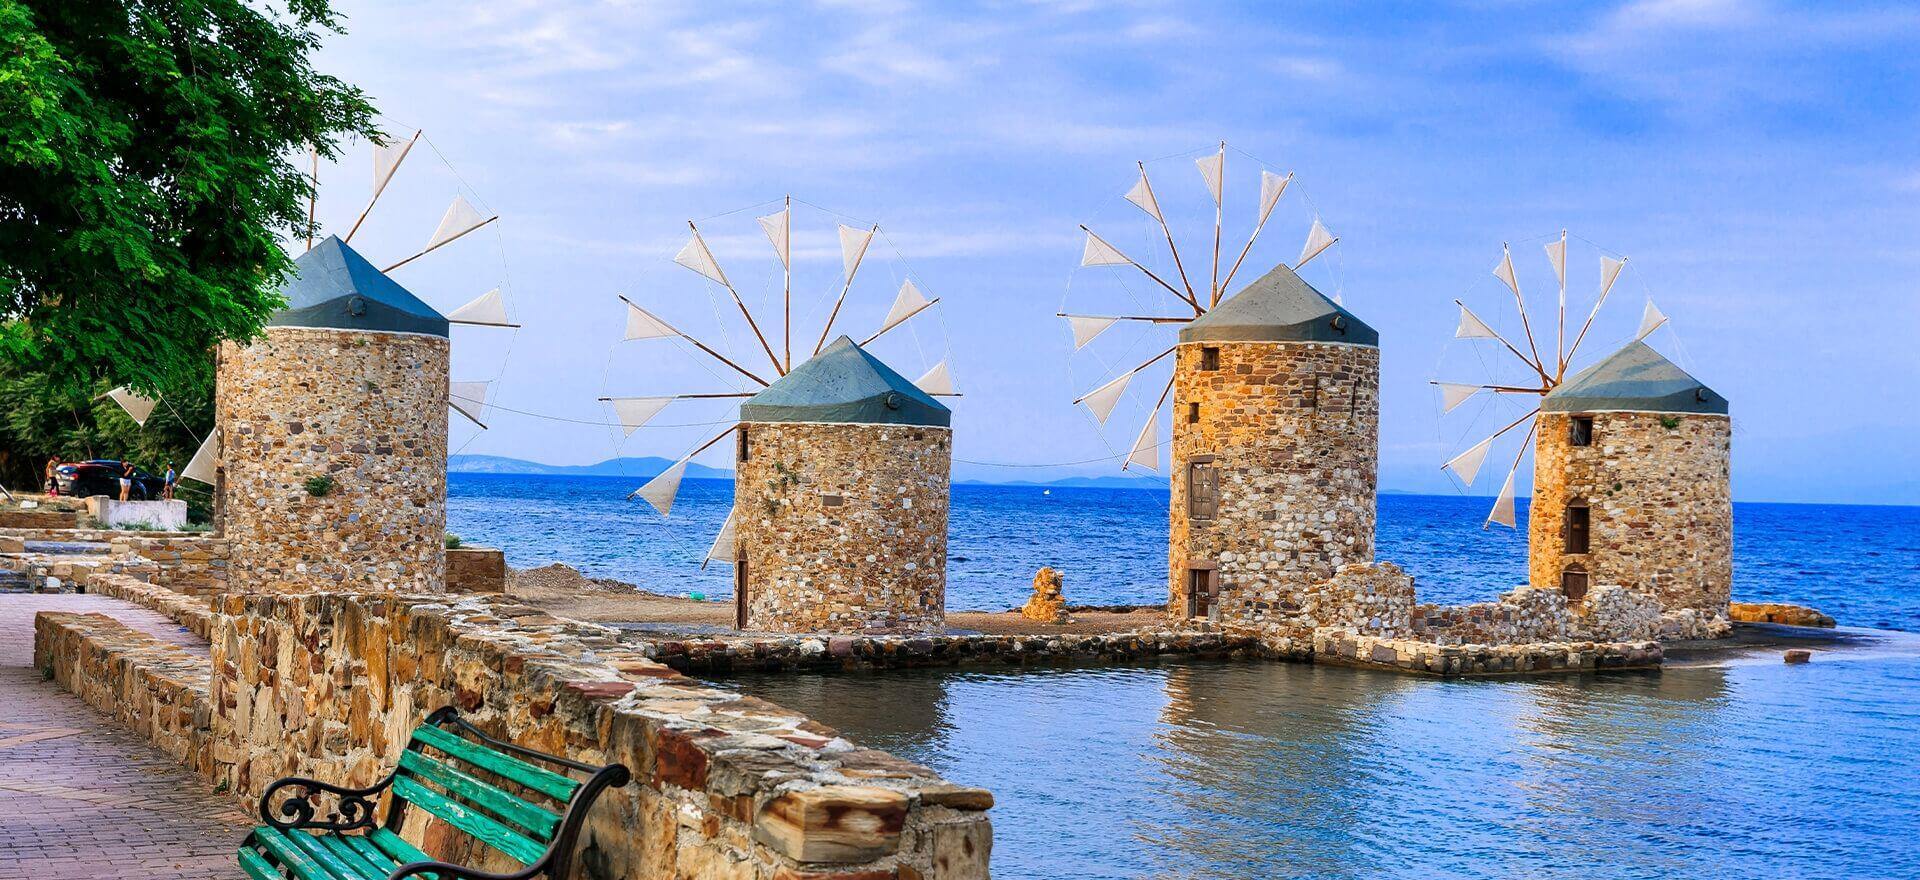 Chios Image